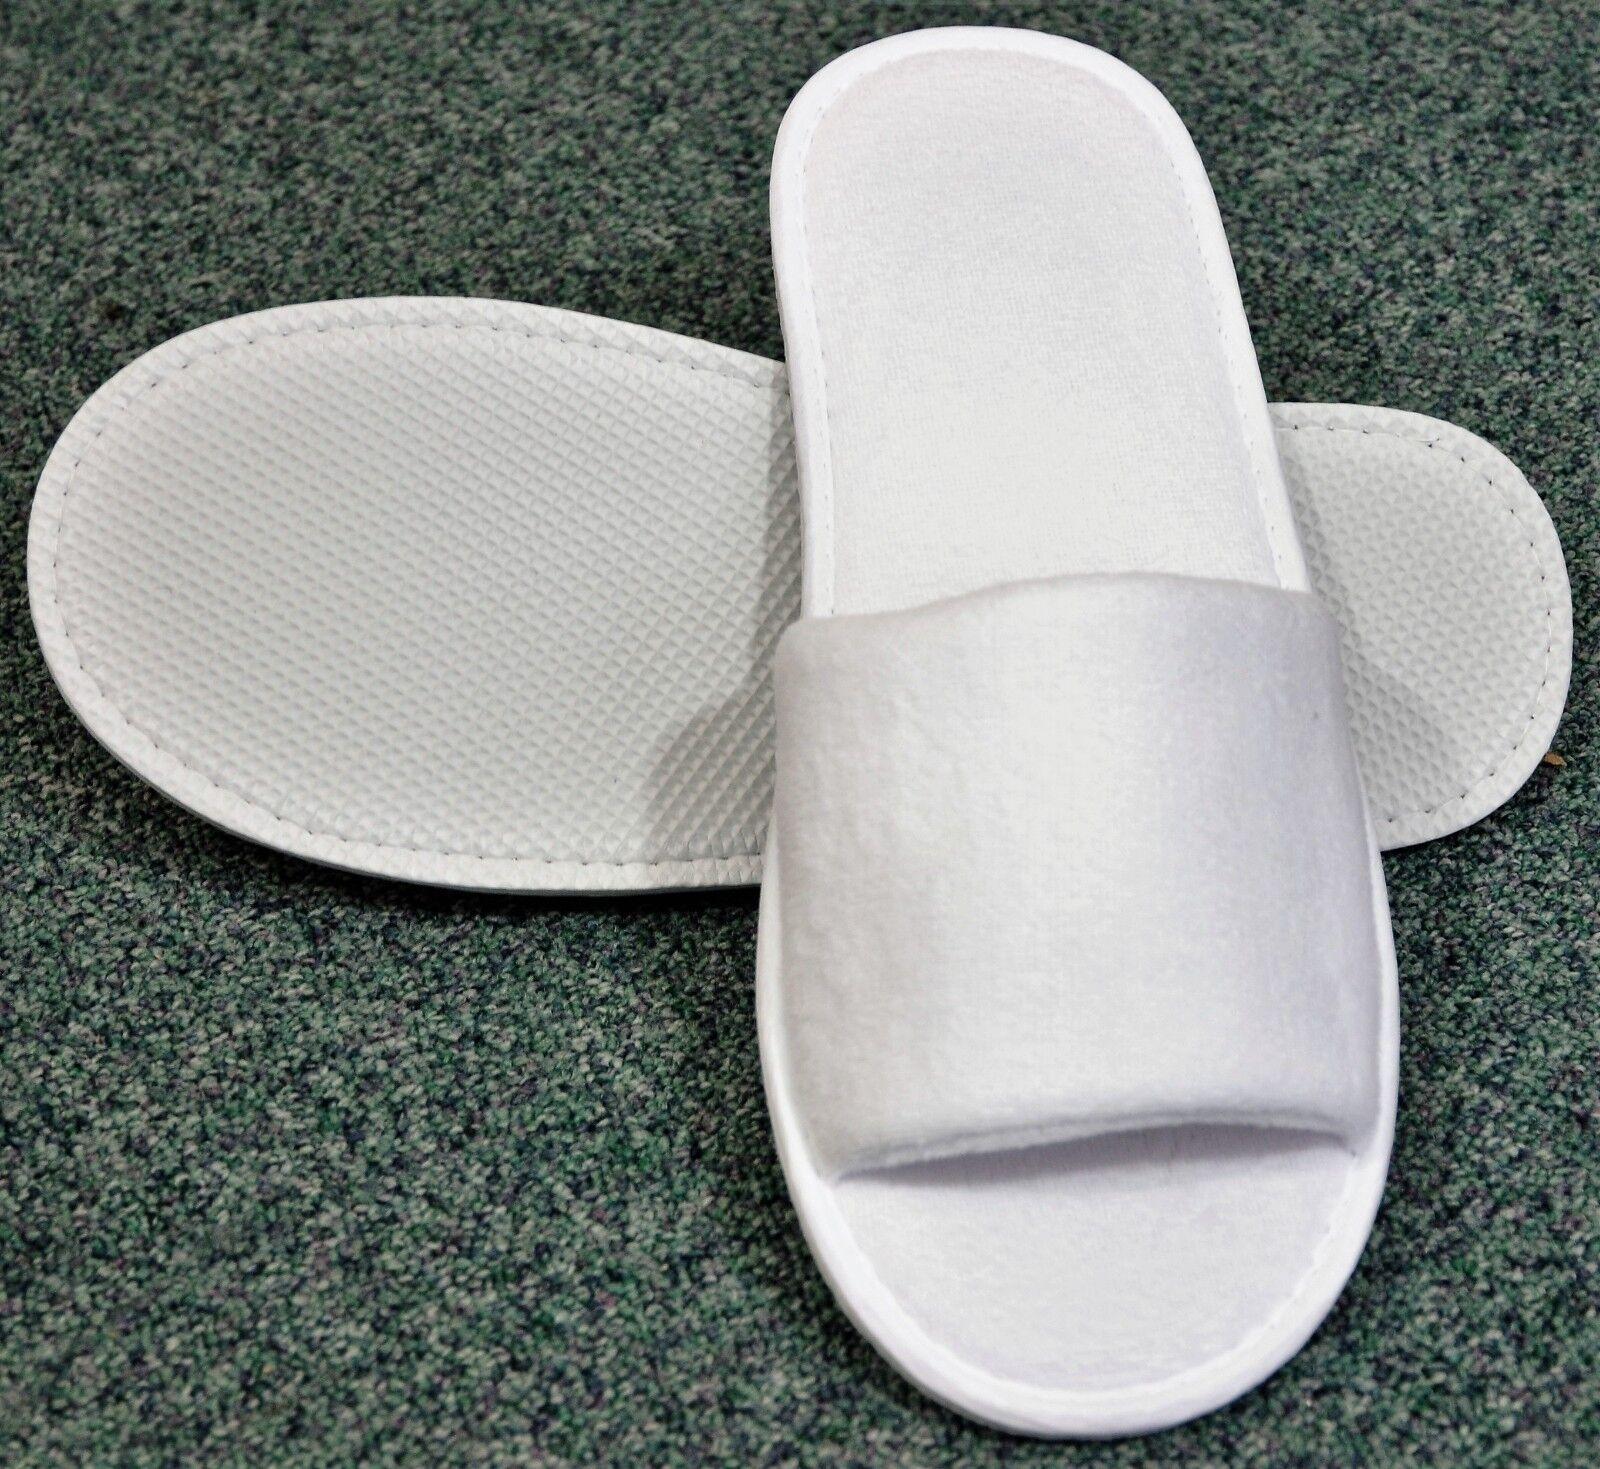 100 White Open Toe Slippers unisex Spa & Hotels